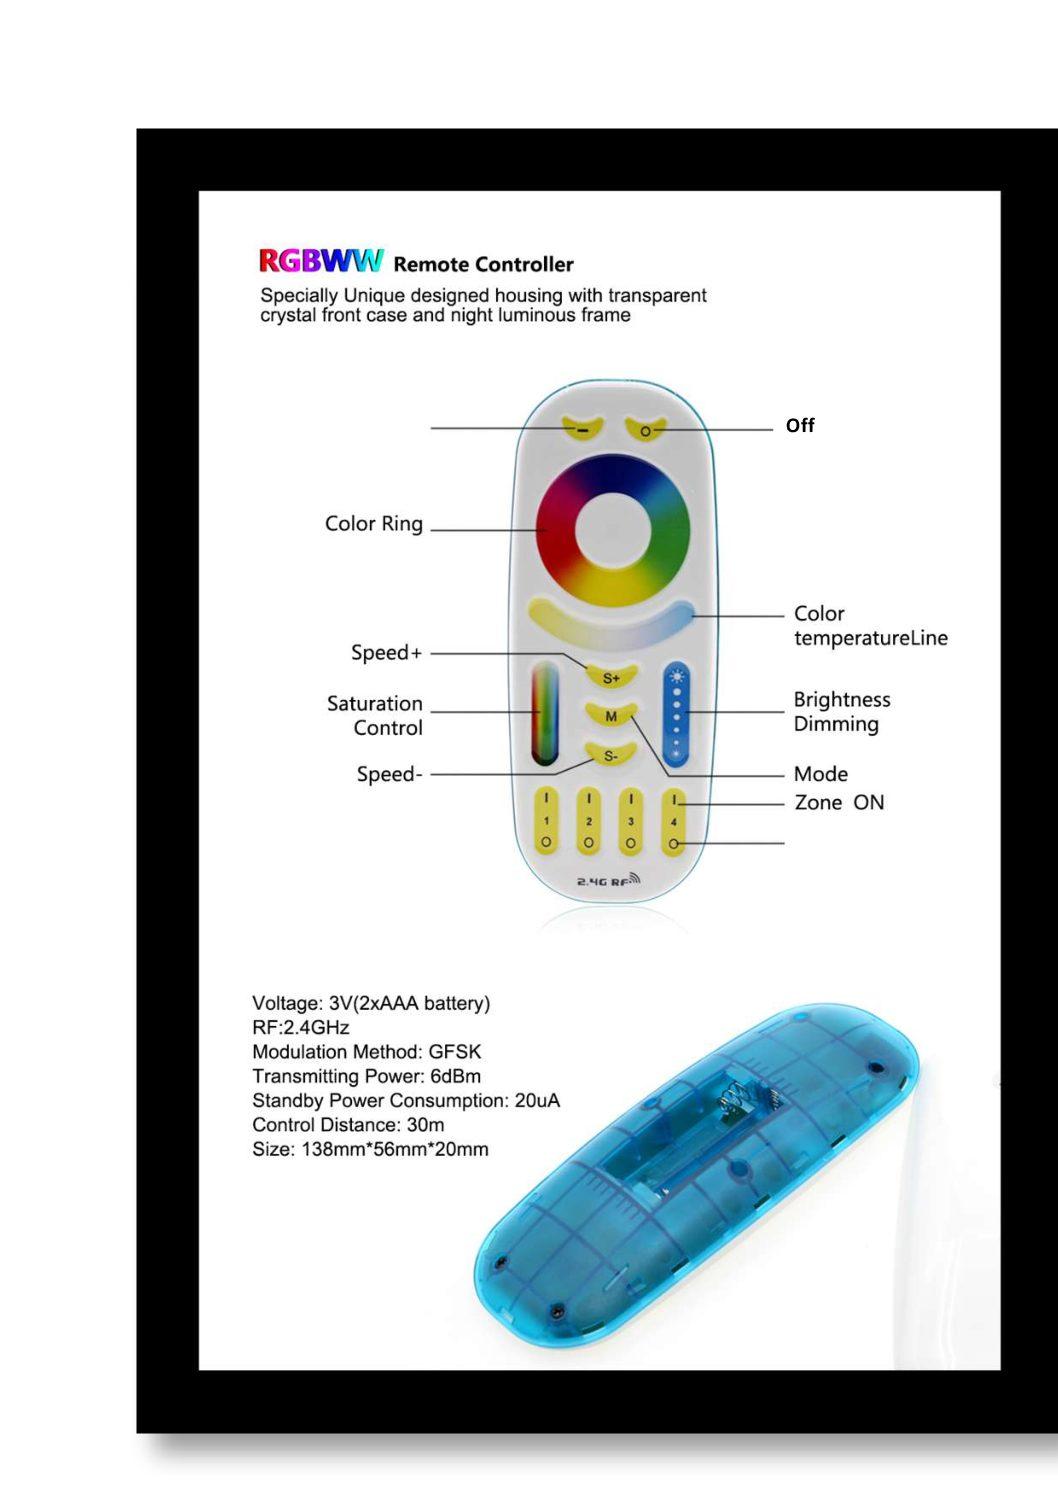 RGBWW FUT0921